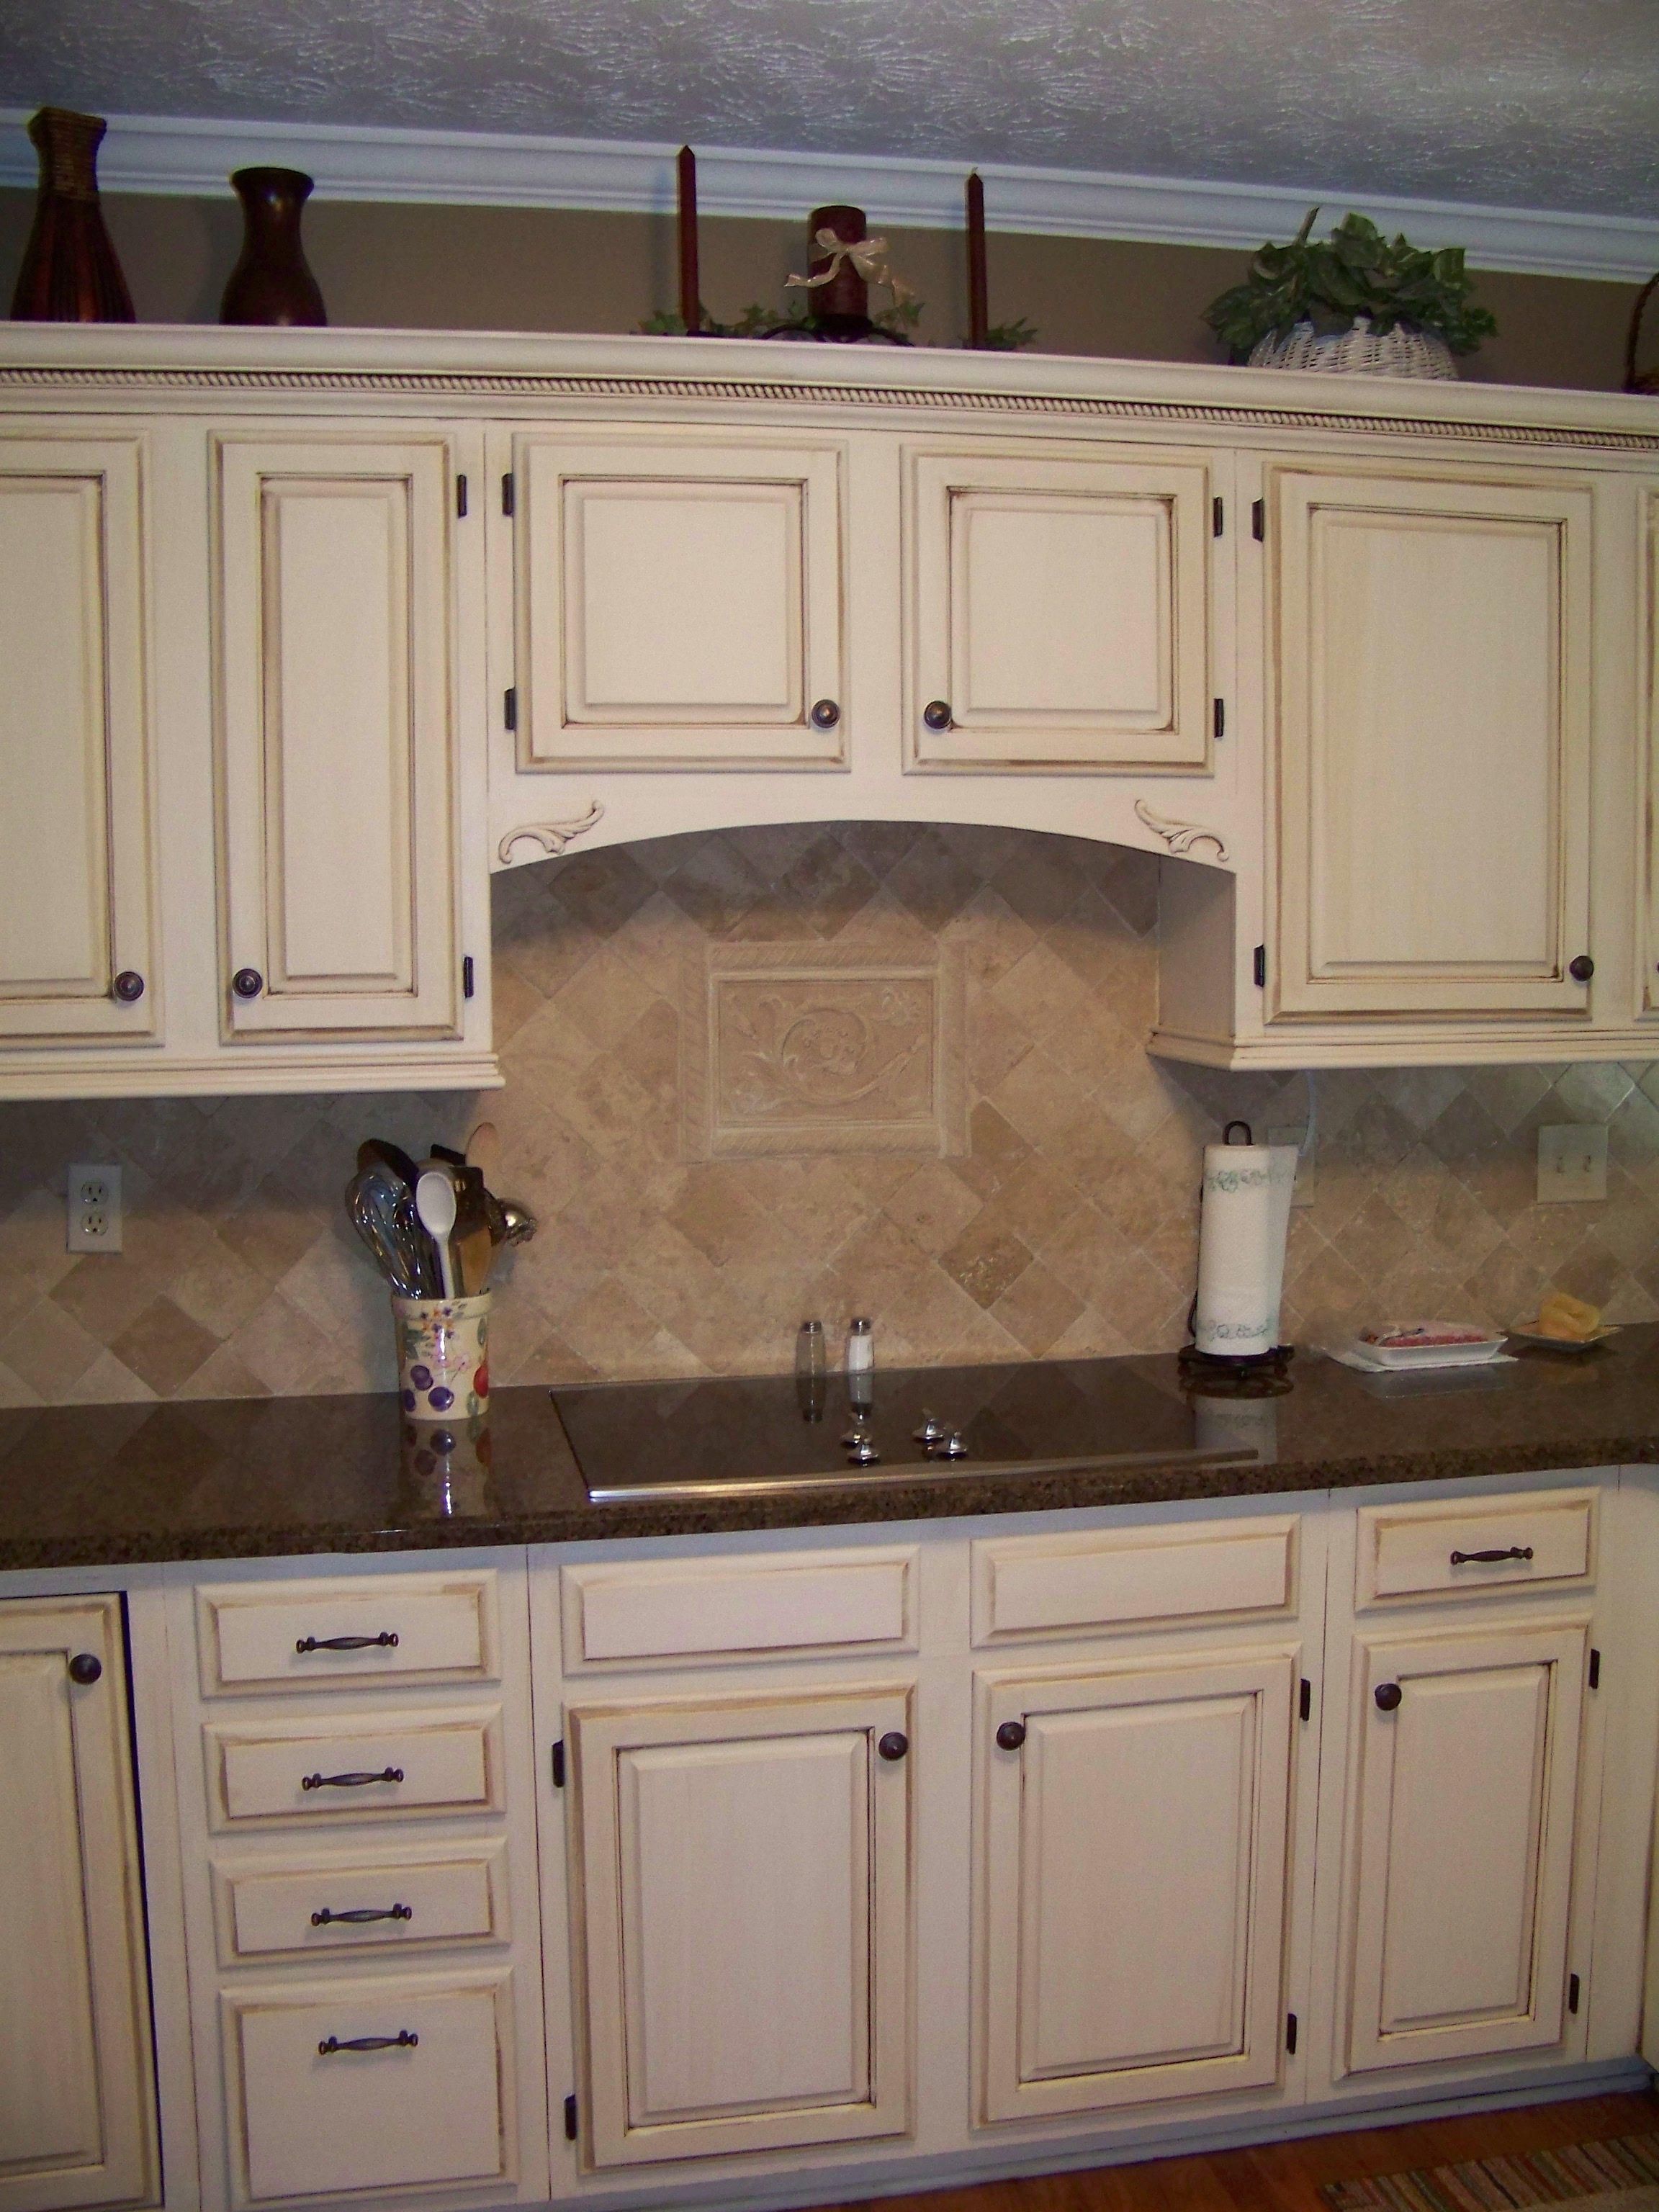 Cream cabinets with dark brown glaze upper cabinets cabinet